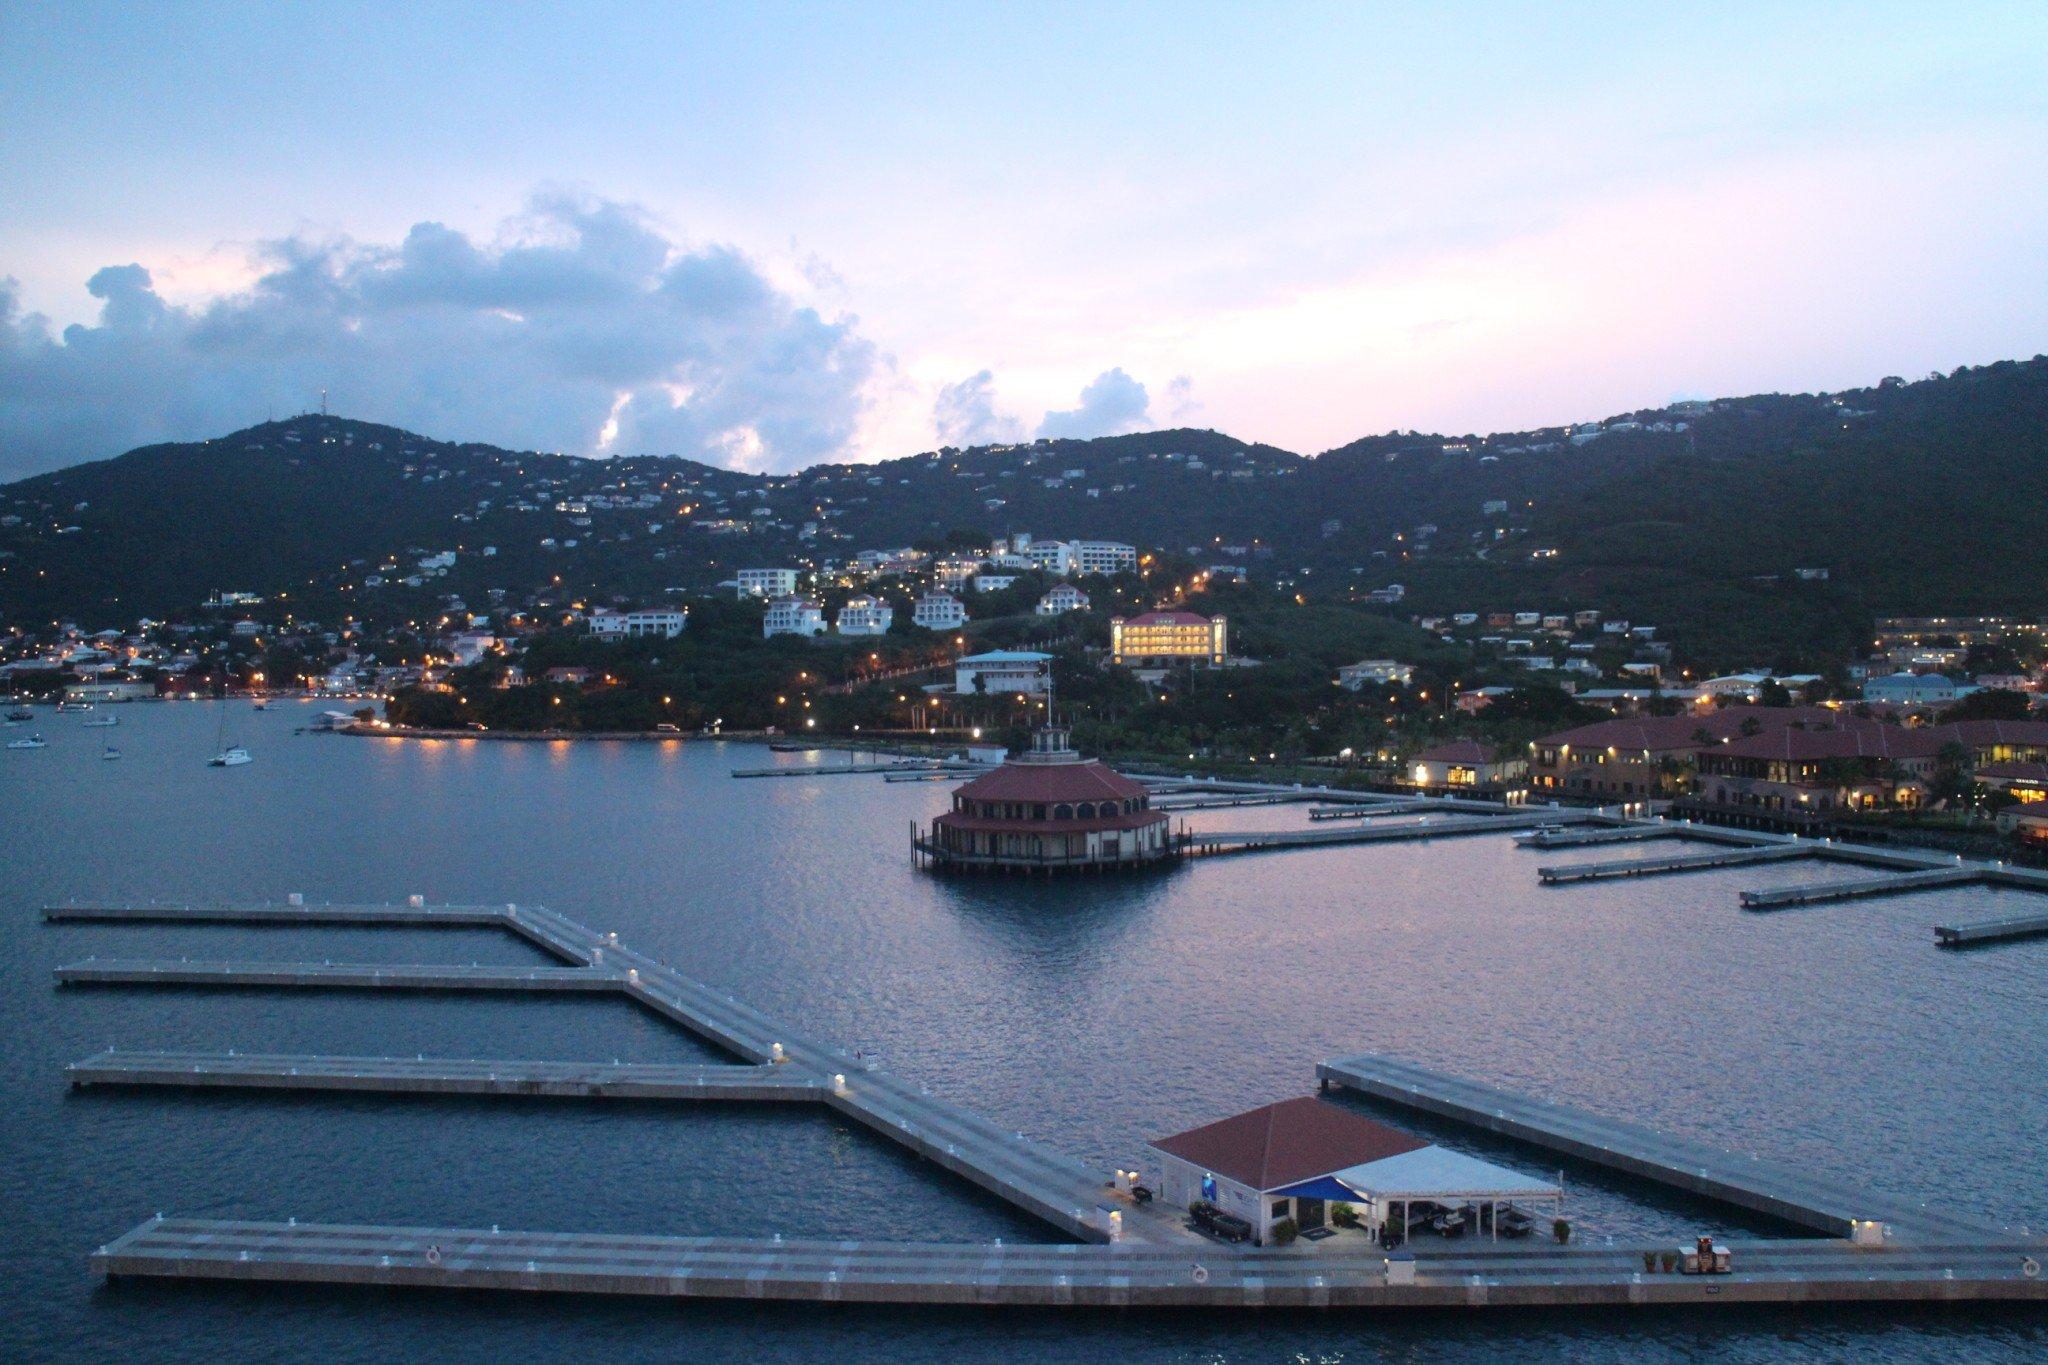 St Thomas Port